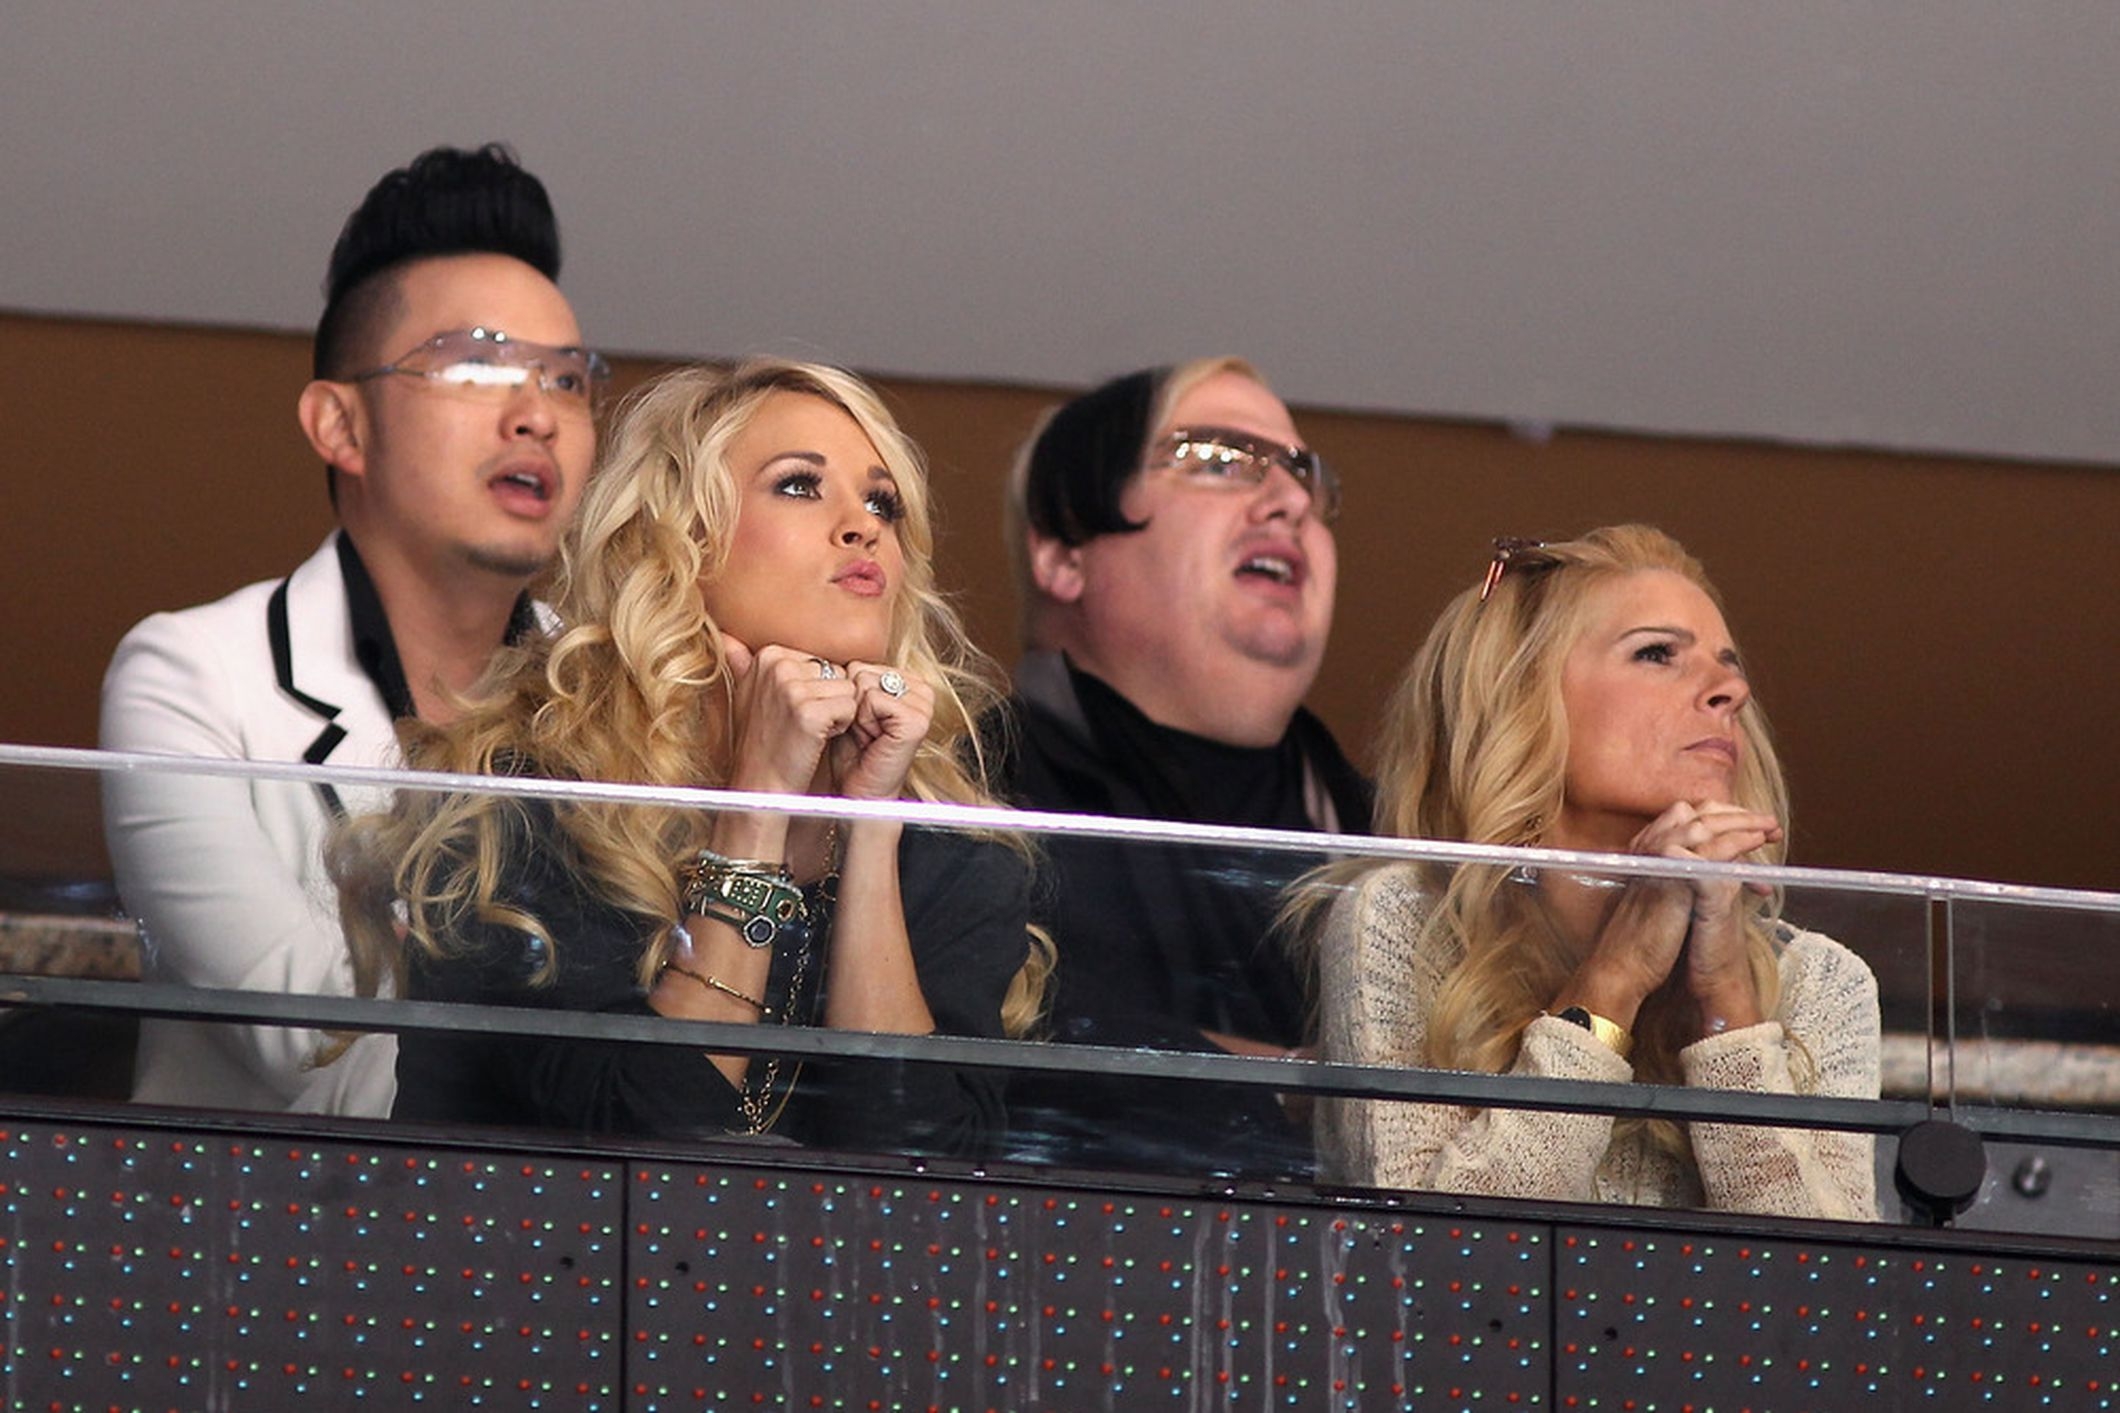 Nashville Predators News: Mike Fishers Wife Chosen to